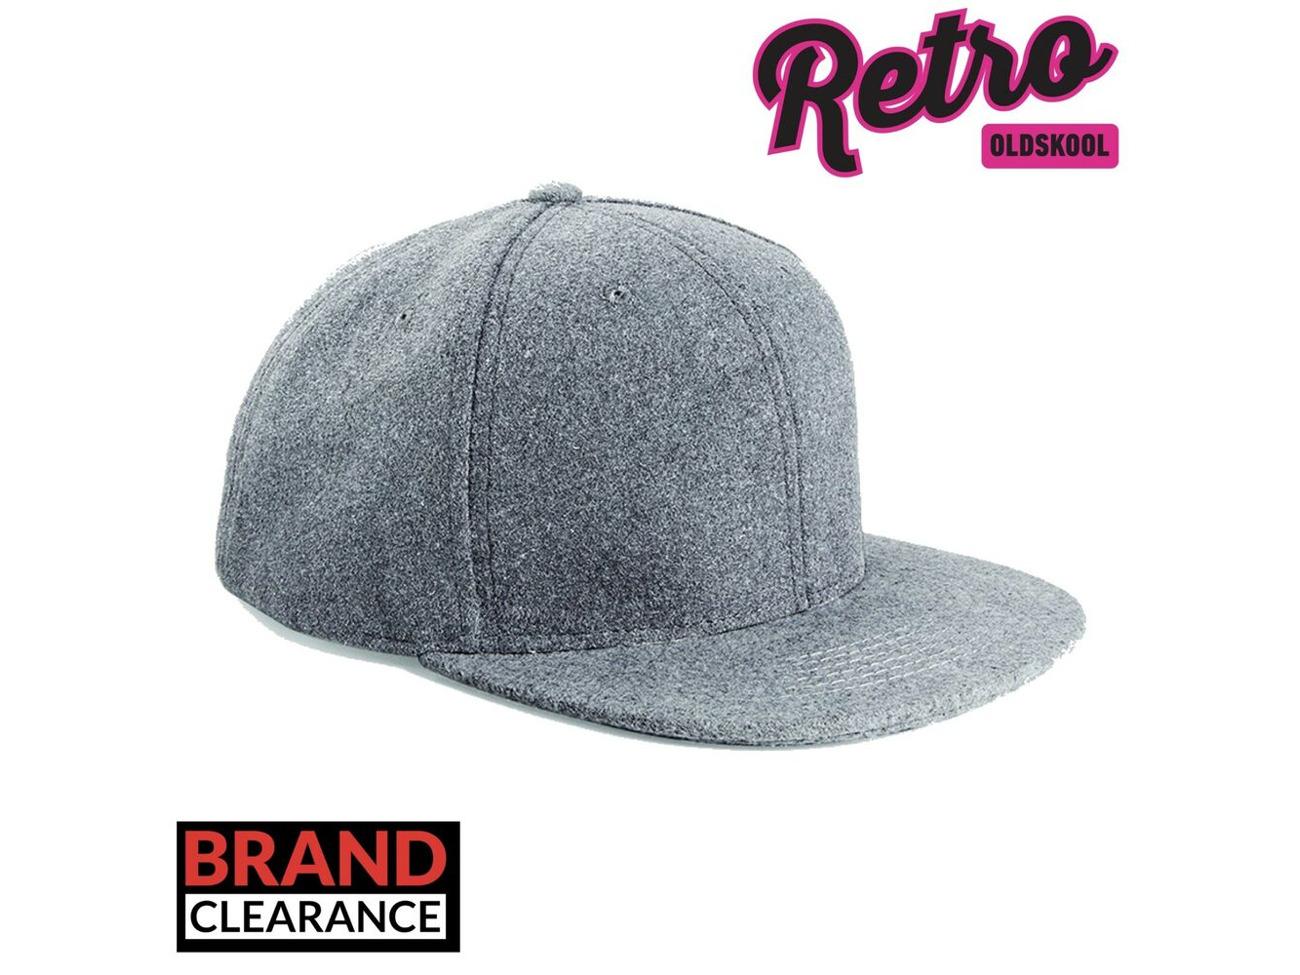 Unisex Womens Mens Melton Wool Flat Peak Adjustable Baseball Snapback Cap Hat